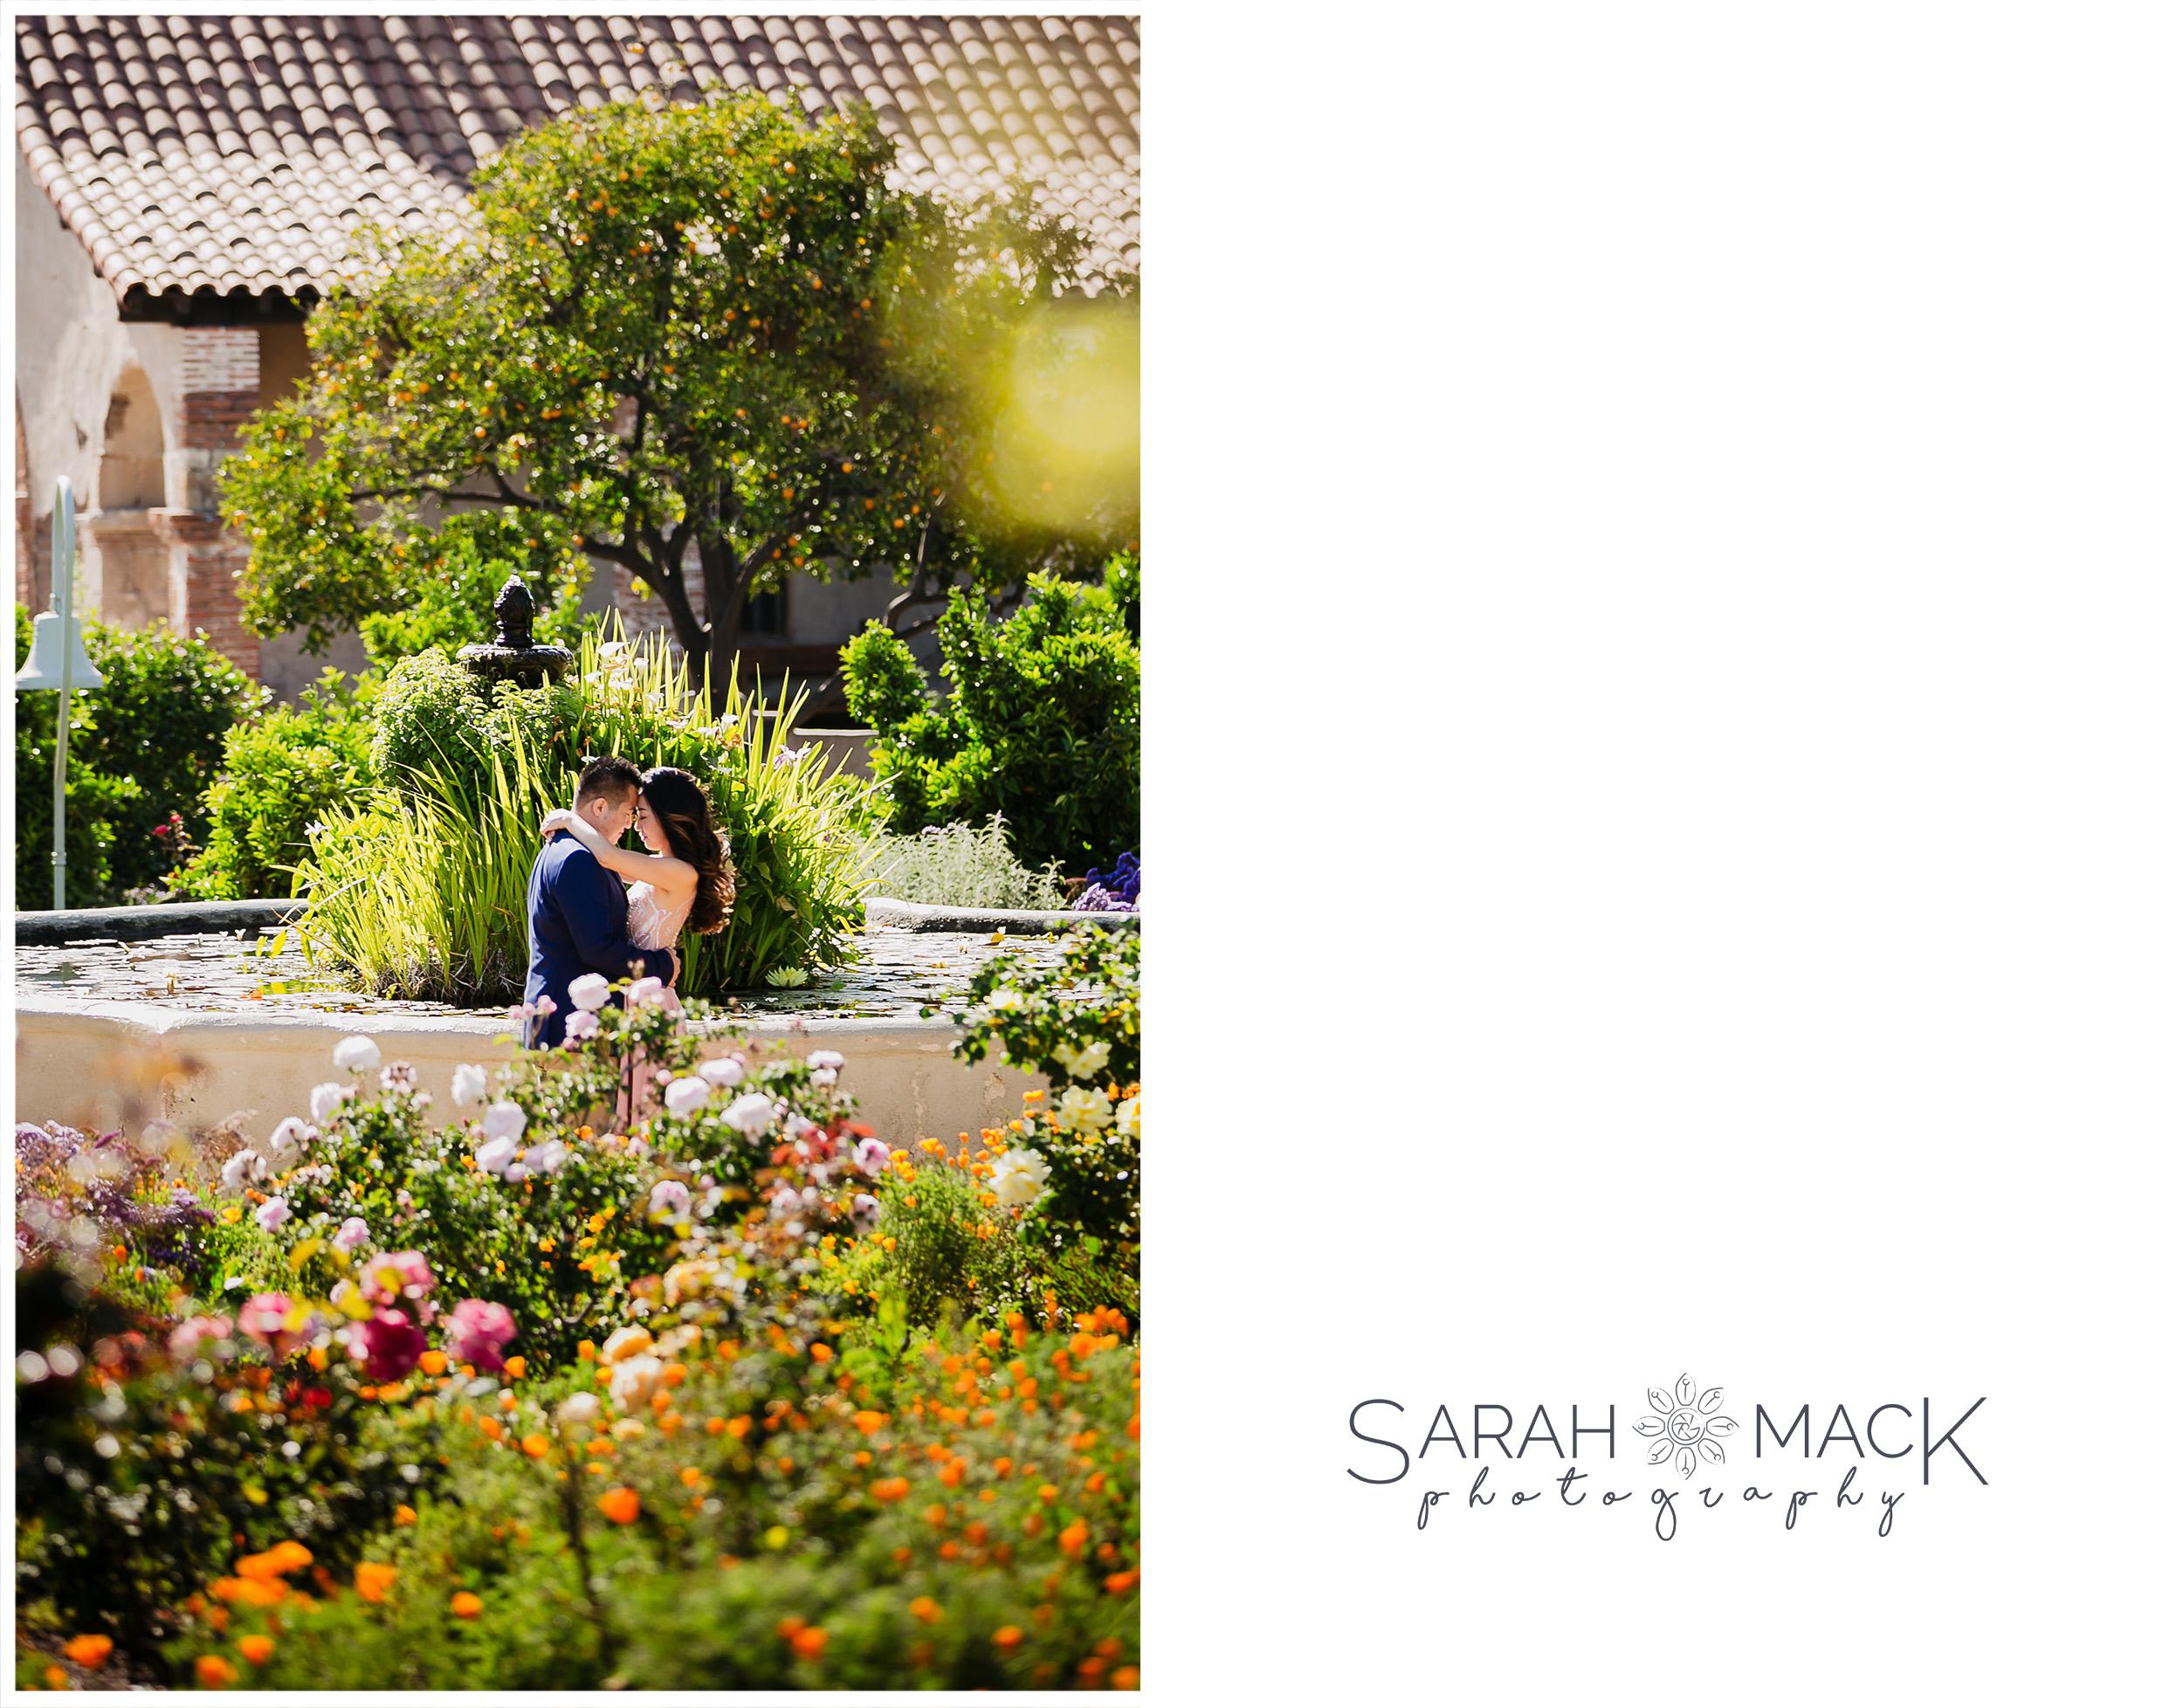 CJ-Mission-San-Juan-Capistrano-Engagement-Photography-6.jpg